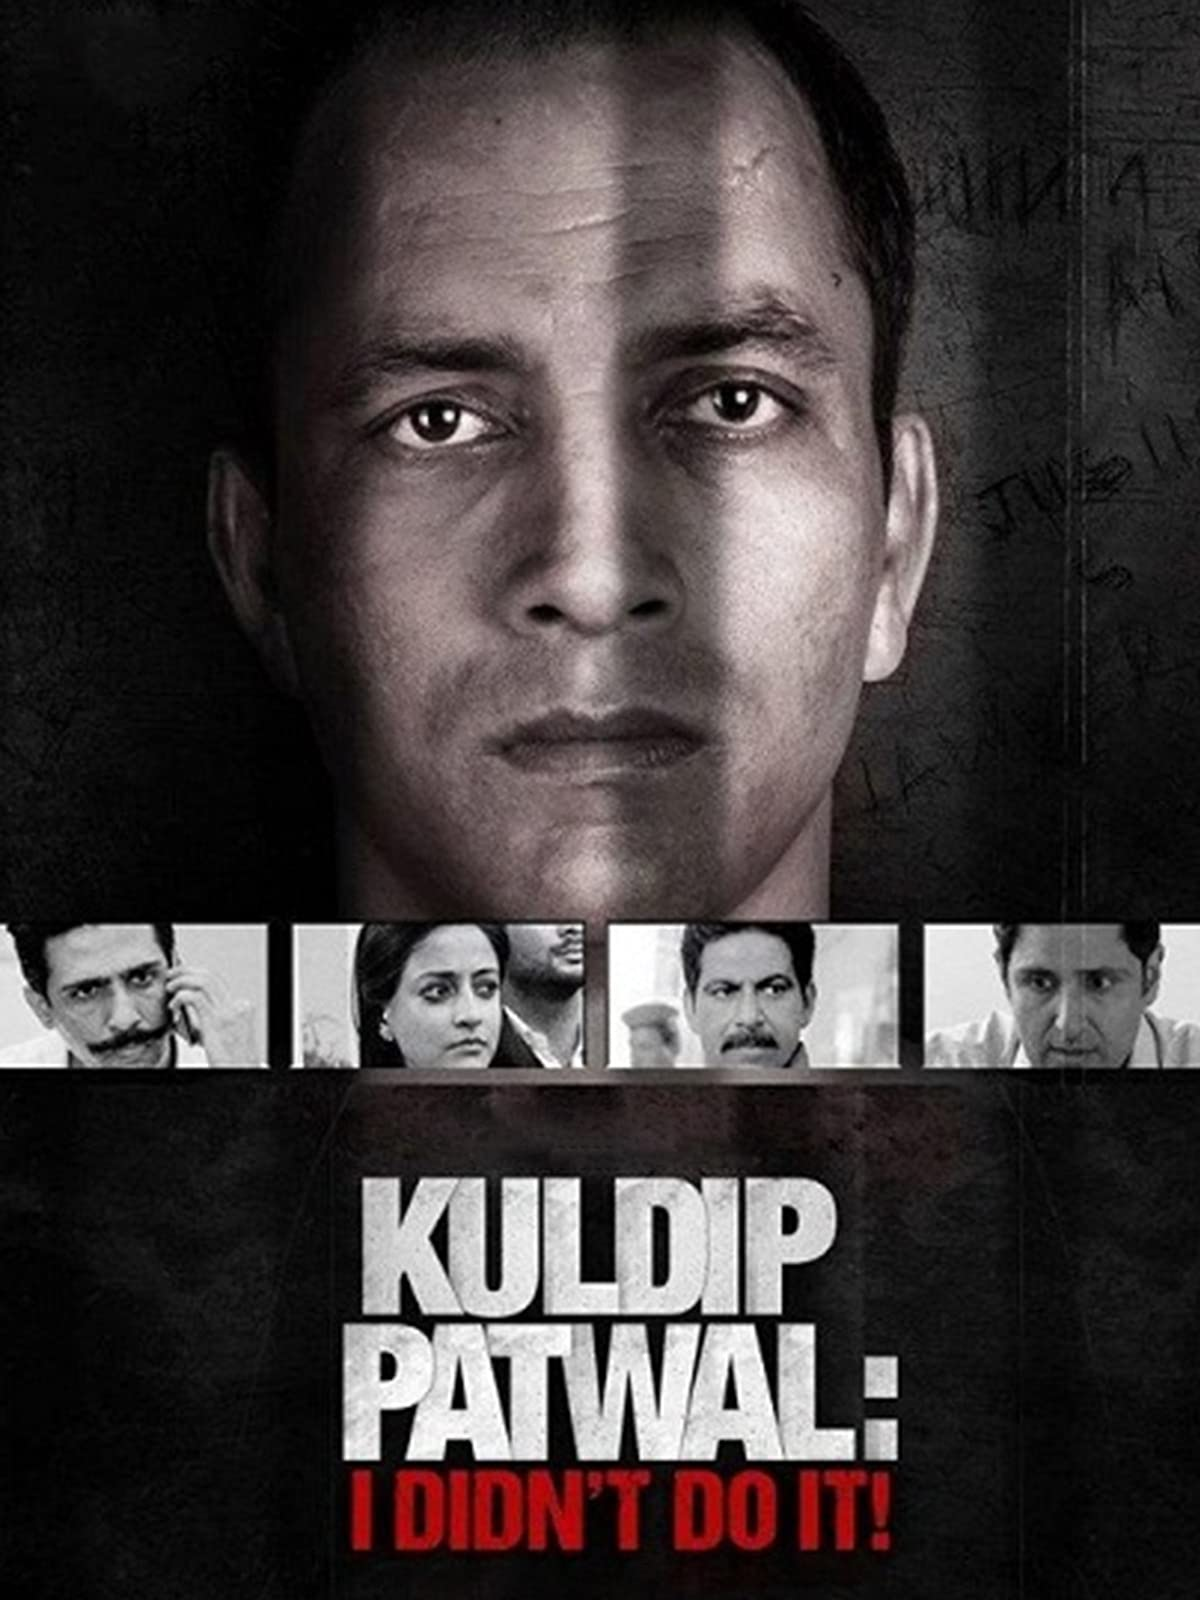 Kuldip Patwal - I Didn't Do It